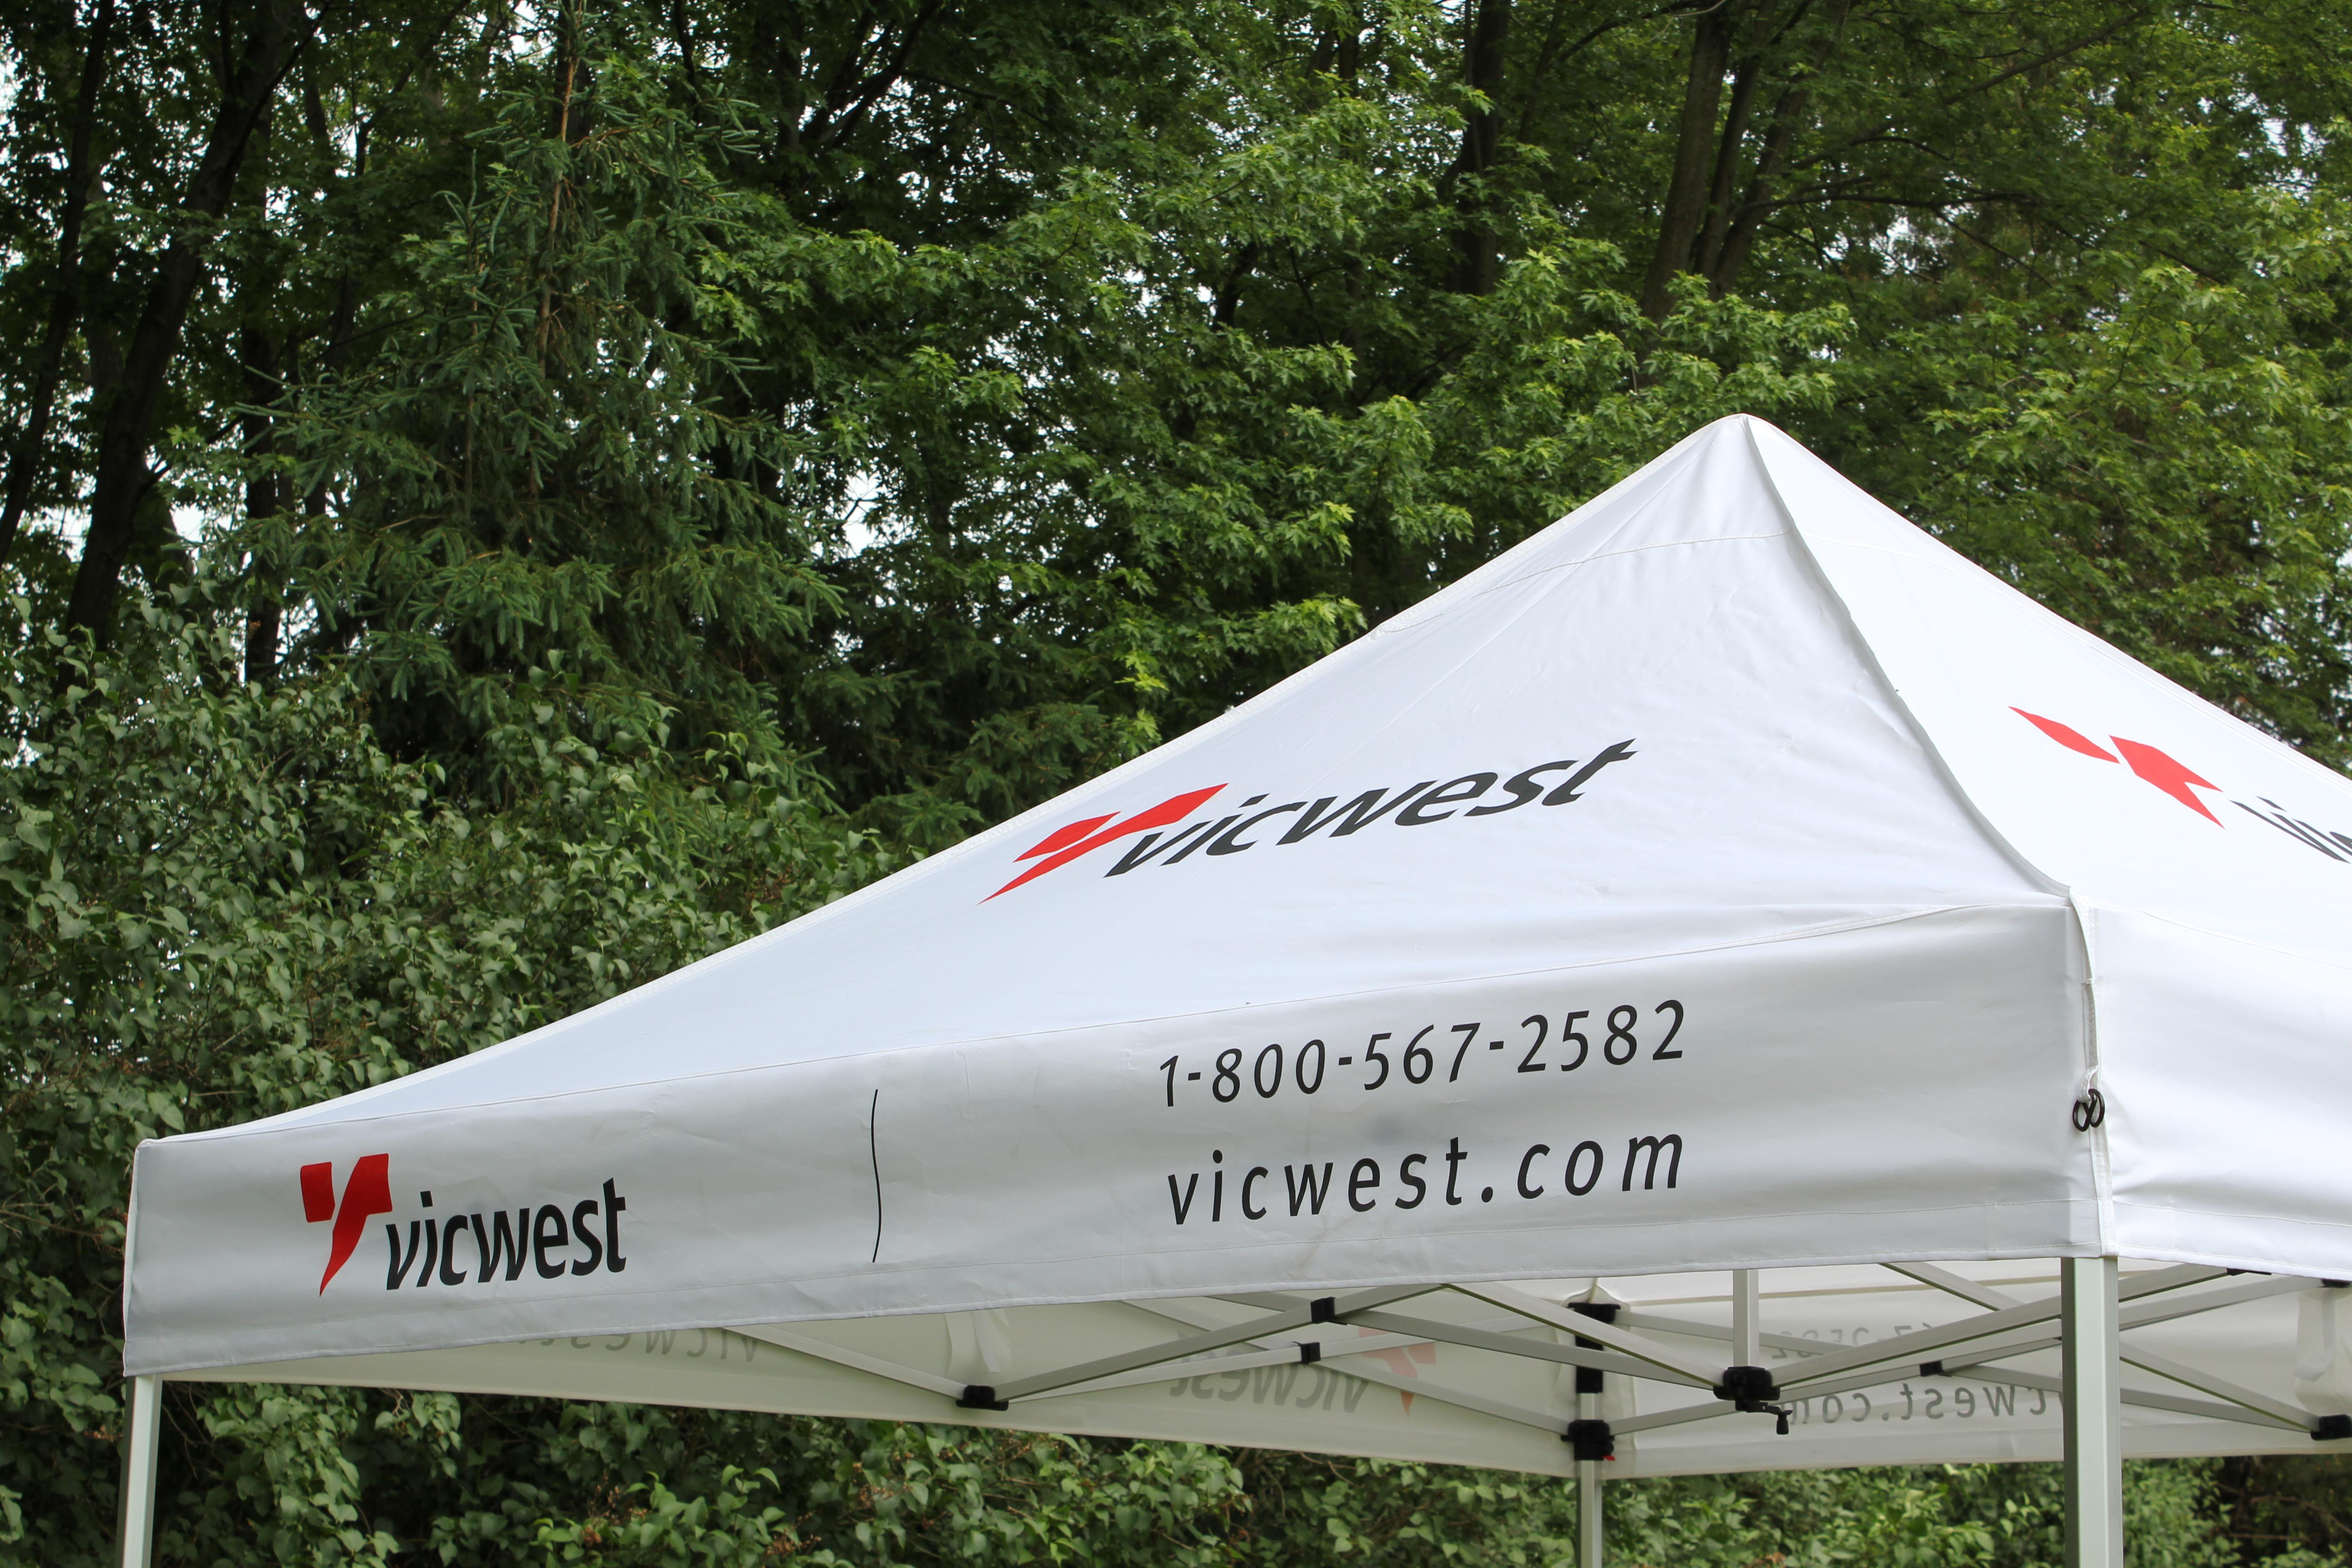 Vicwest Milieu Event Canopy 3x3